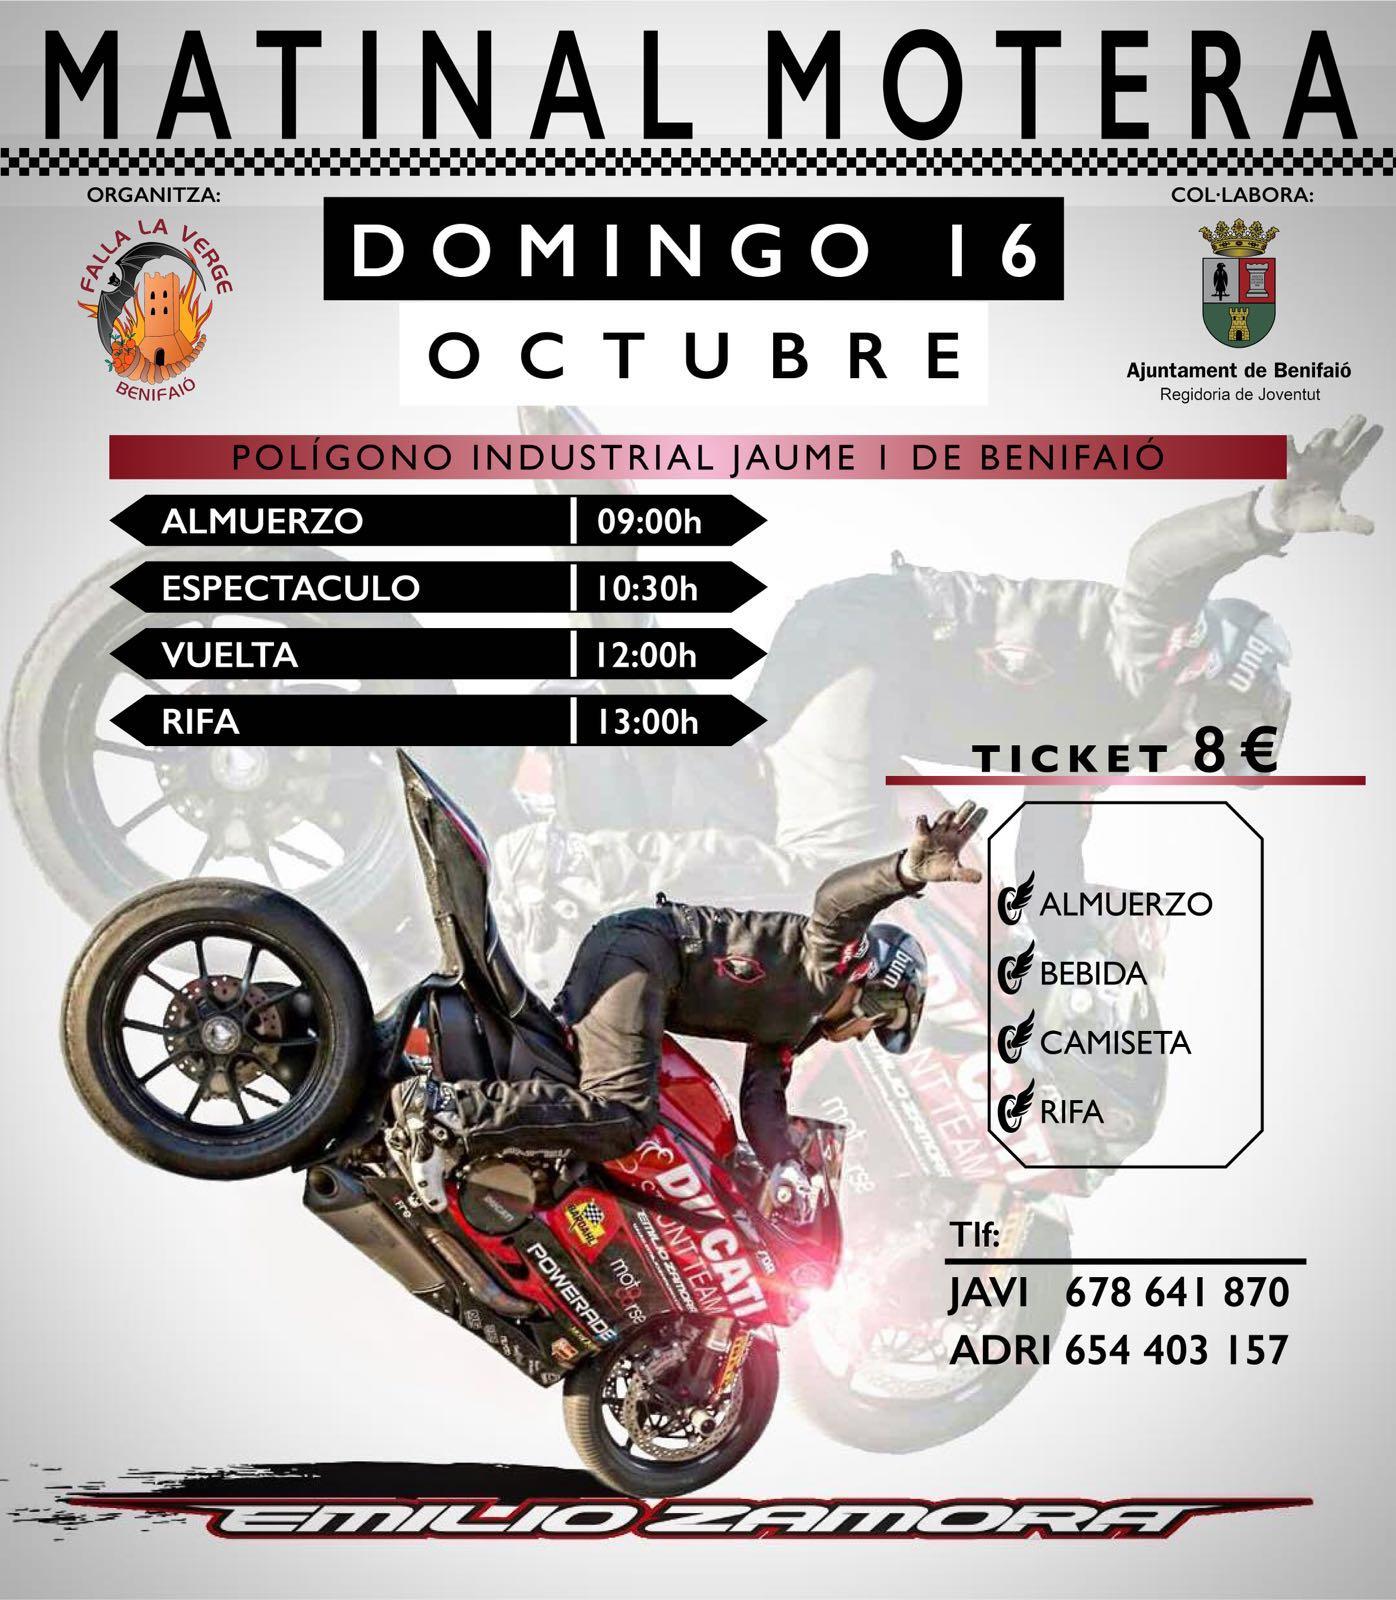 benifaio_falla_la_verge_matinal_motera_valencia_emilio_zamora_ducati_stunt_team_motor_show_2016